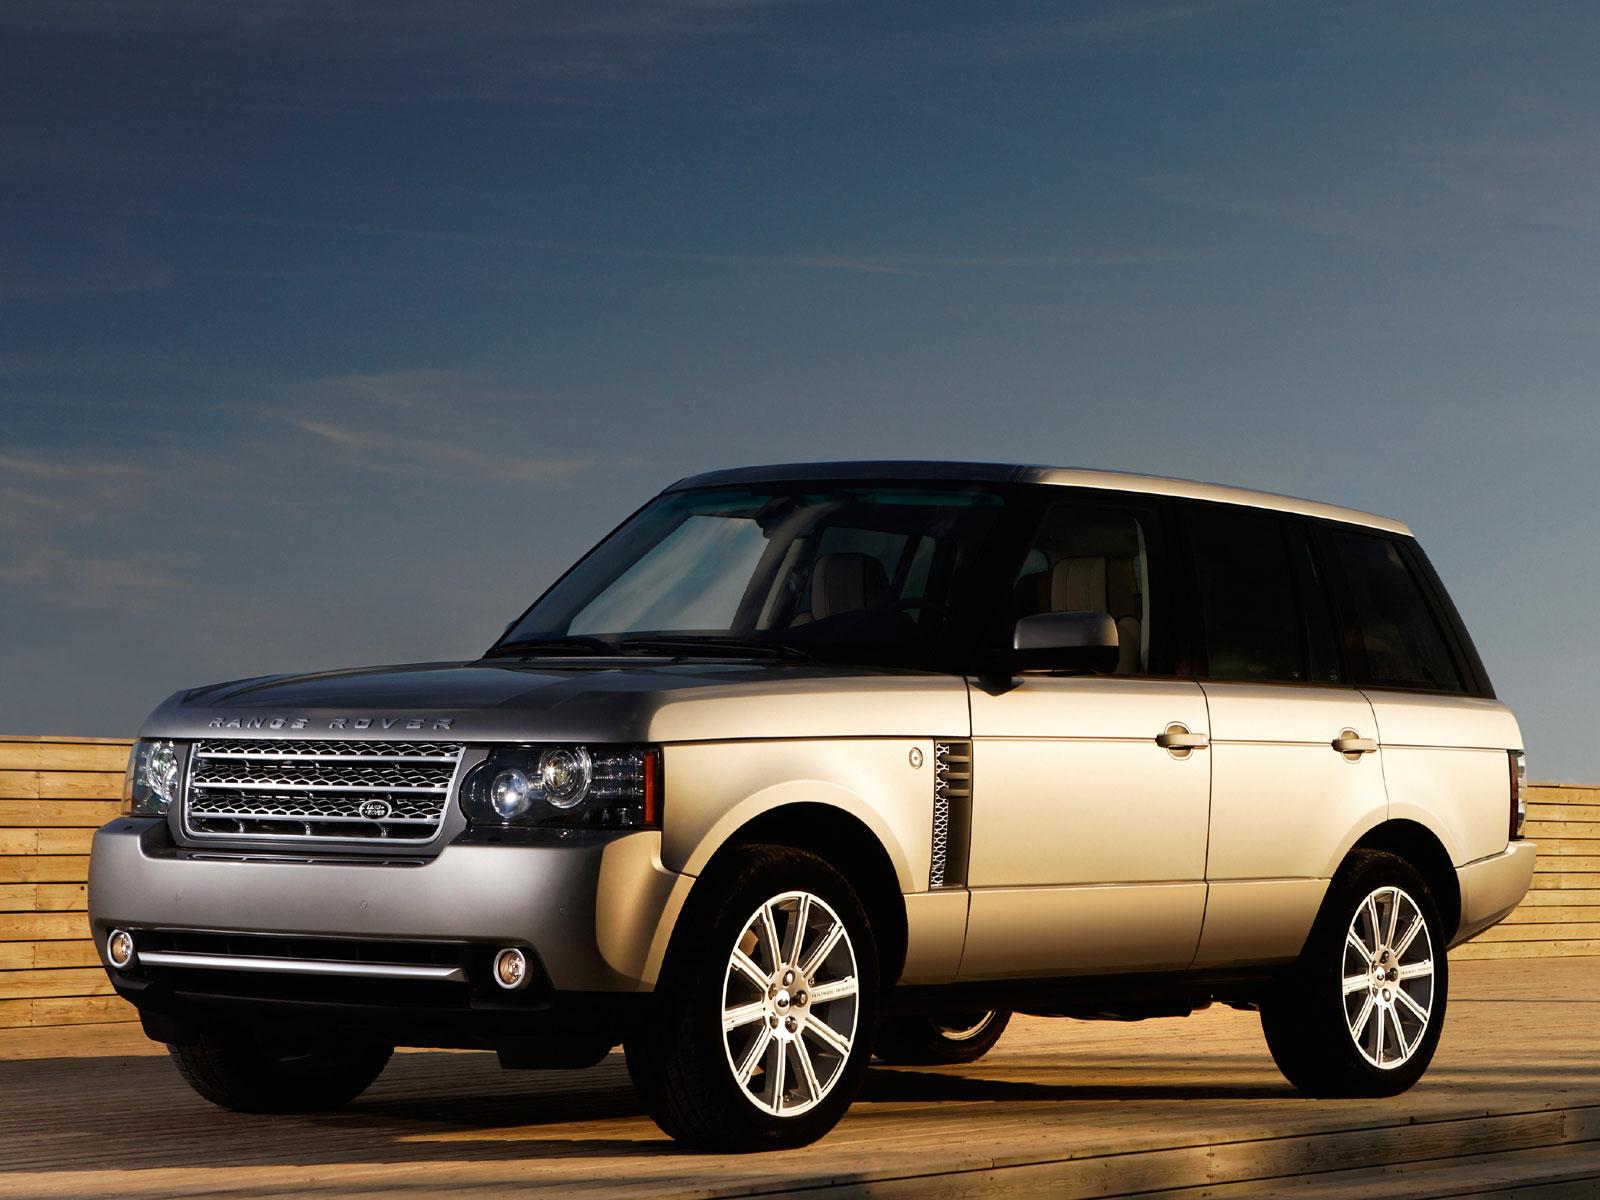 2002 2012 land rover range rover autoguru. Black Bedroom Furniture Sets. Home Design Ideas